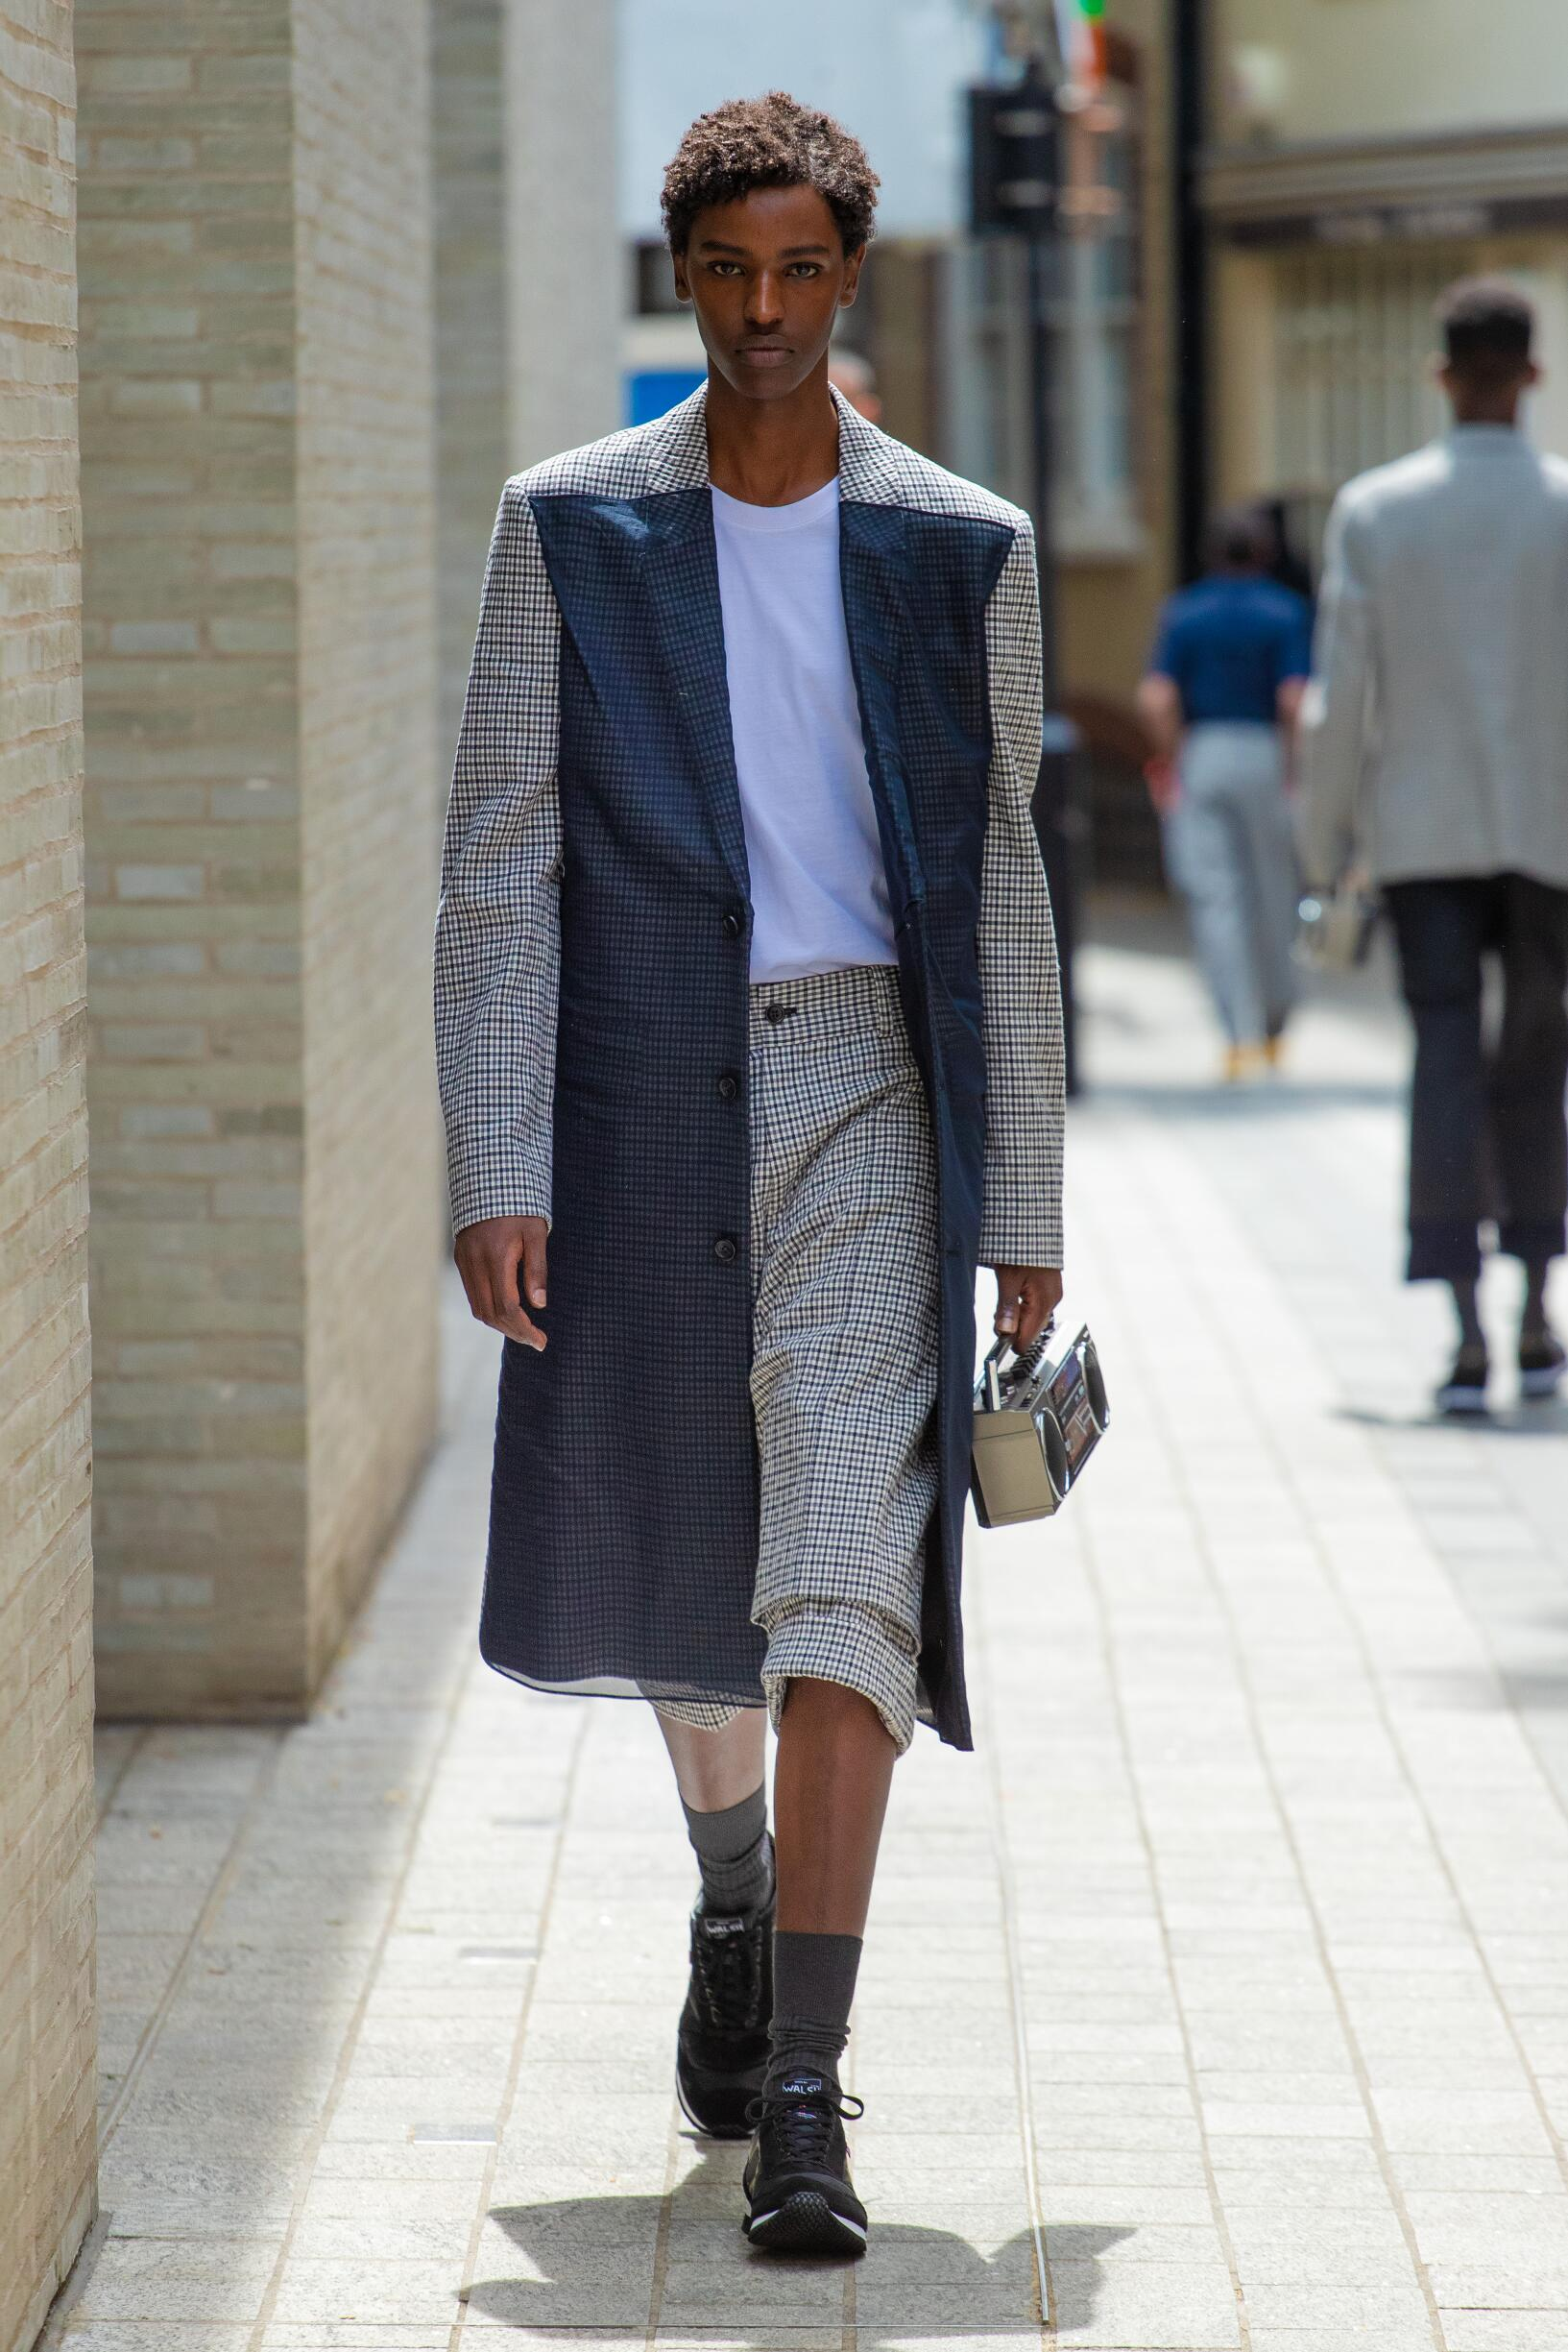 Runway Chalayan Spring Summer 2020 Men's Collection London Fashion Week